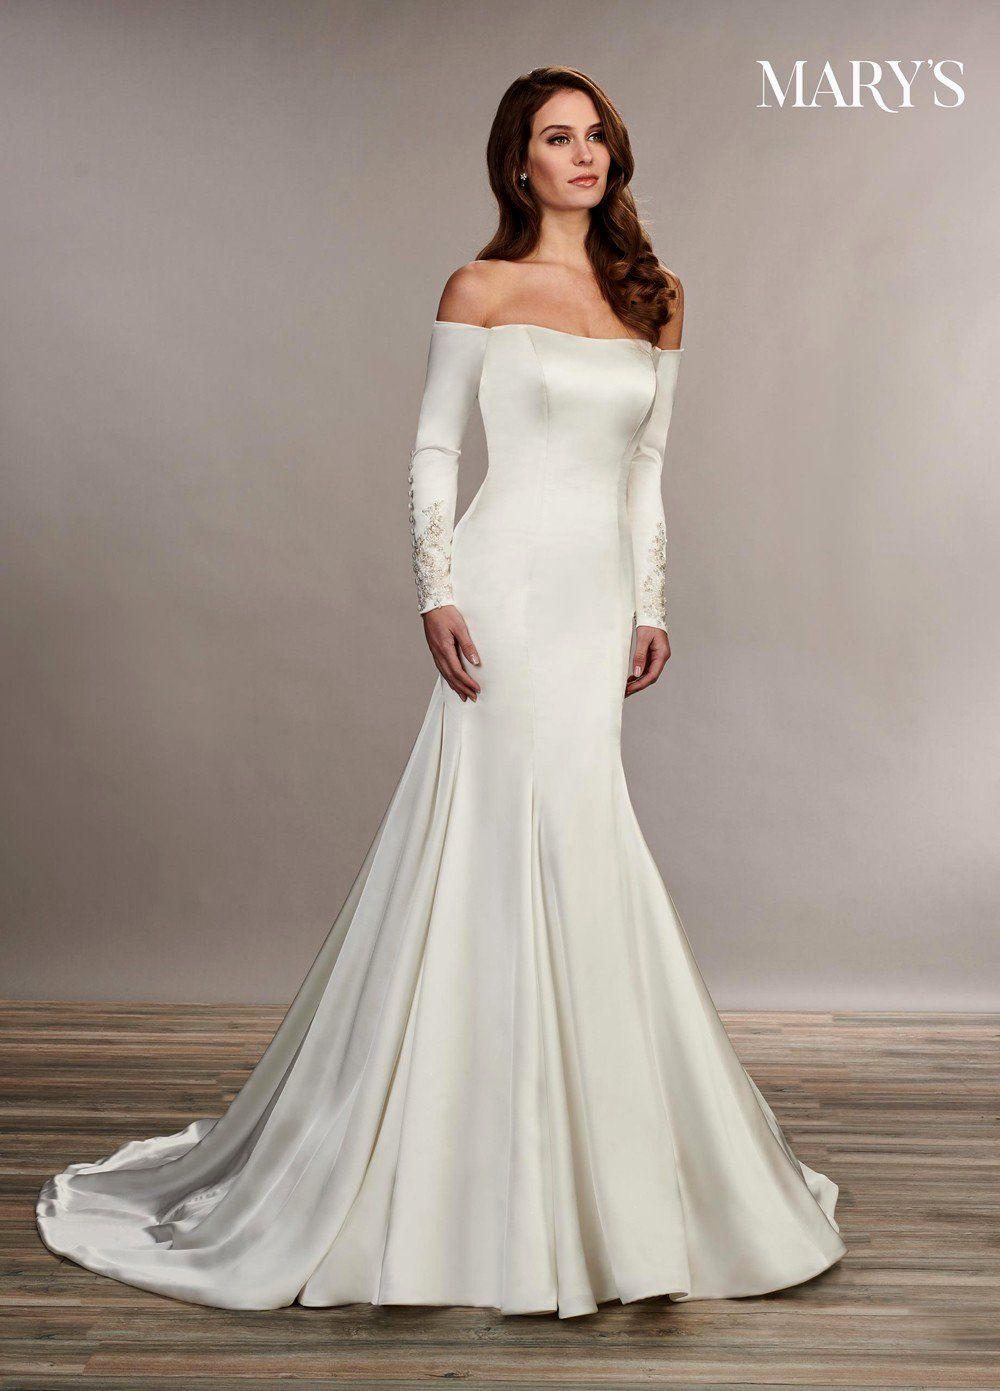 Simple Satin Wedding Dress Awesome Marys Bridal Mb3072 Long Sleeve Wedding Gown Trumpet Bridal Gown Bridal Dresses Long Sleeve Wedding Gowns